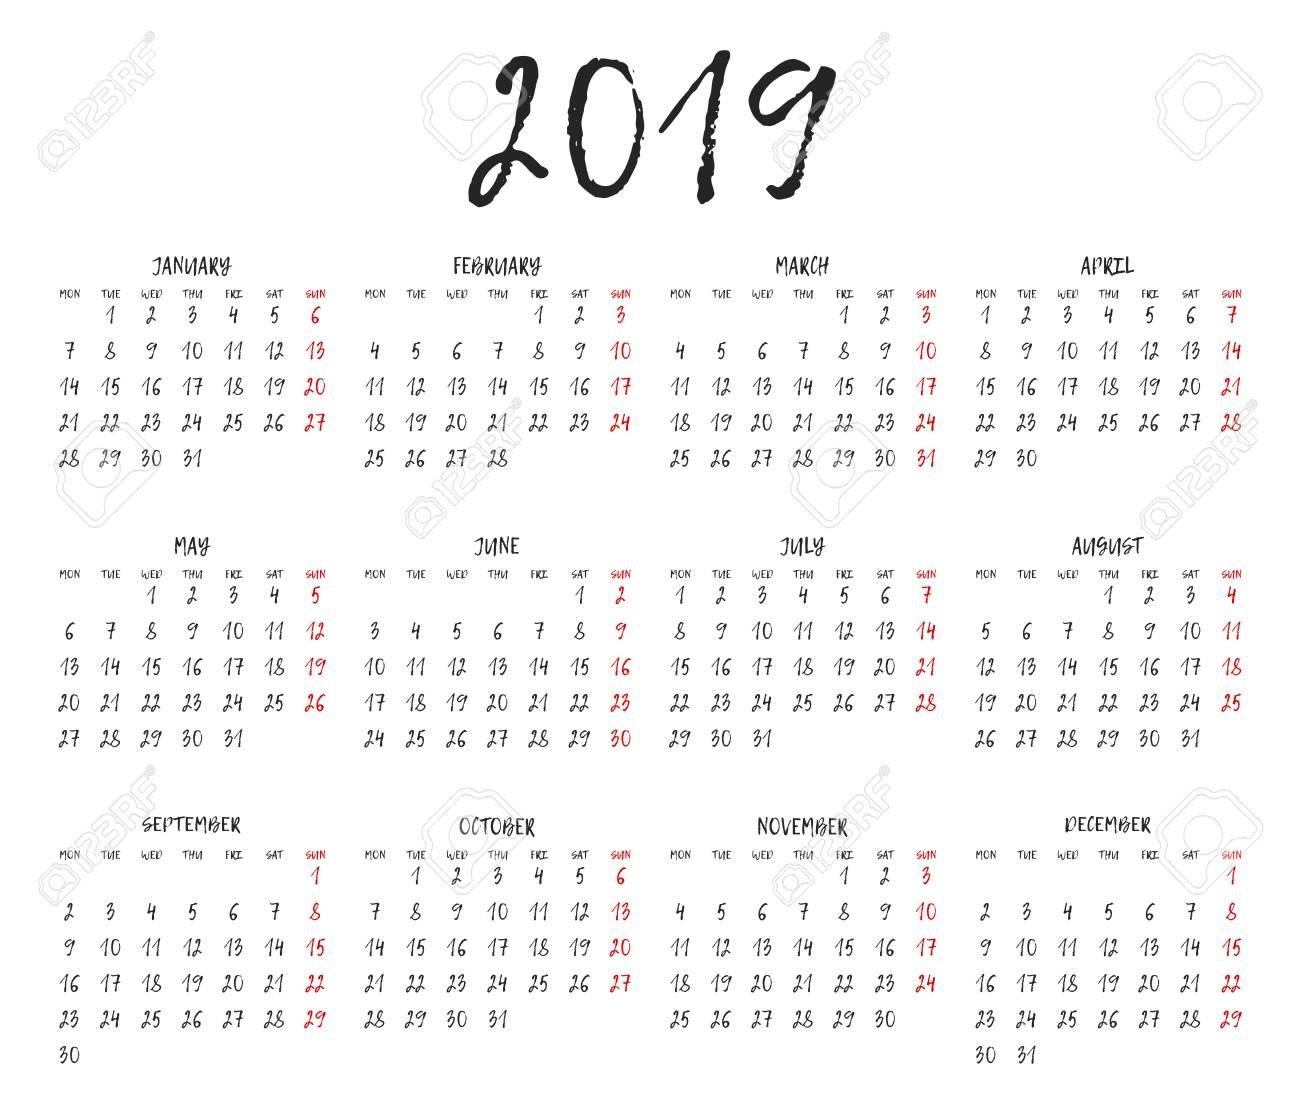 Simple Calendar Grid For 2019. Calendar Template. Week Starts Monday Calendar 2019 Grid